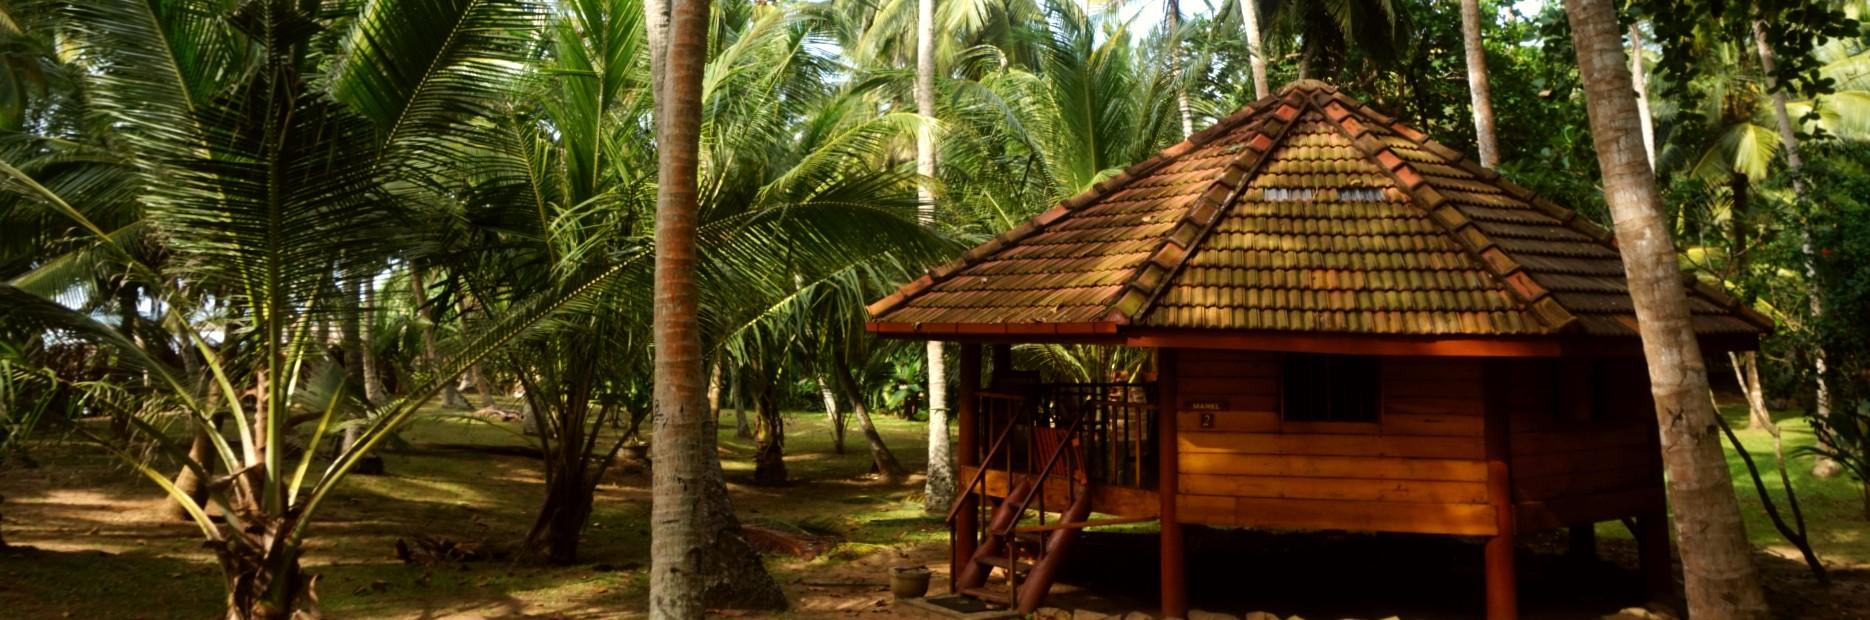 Sri Lanka overnachting